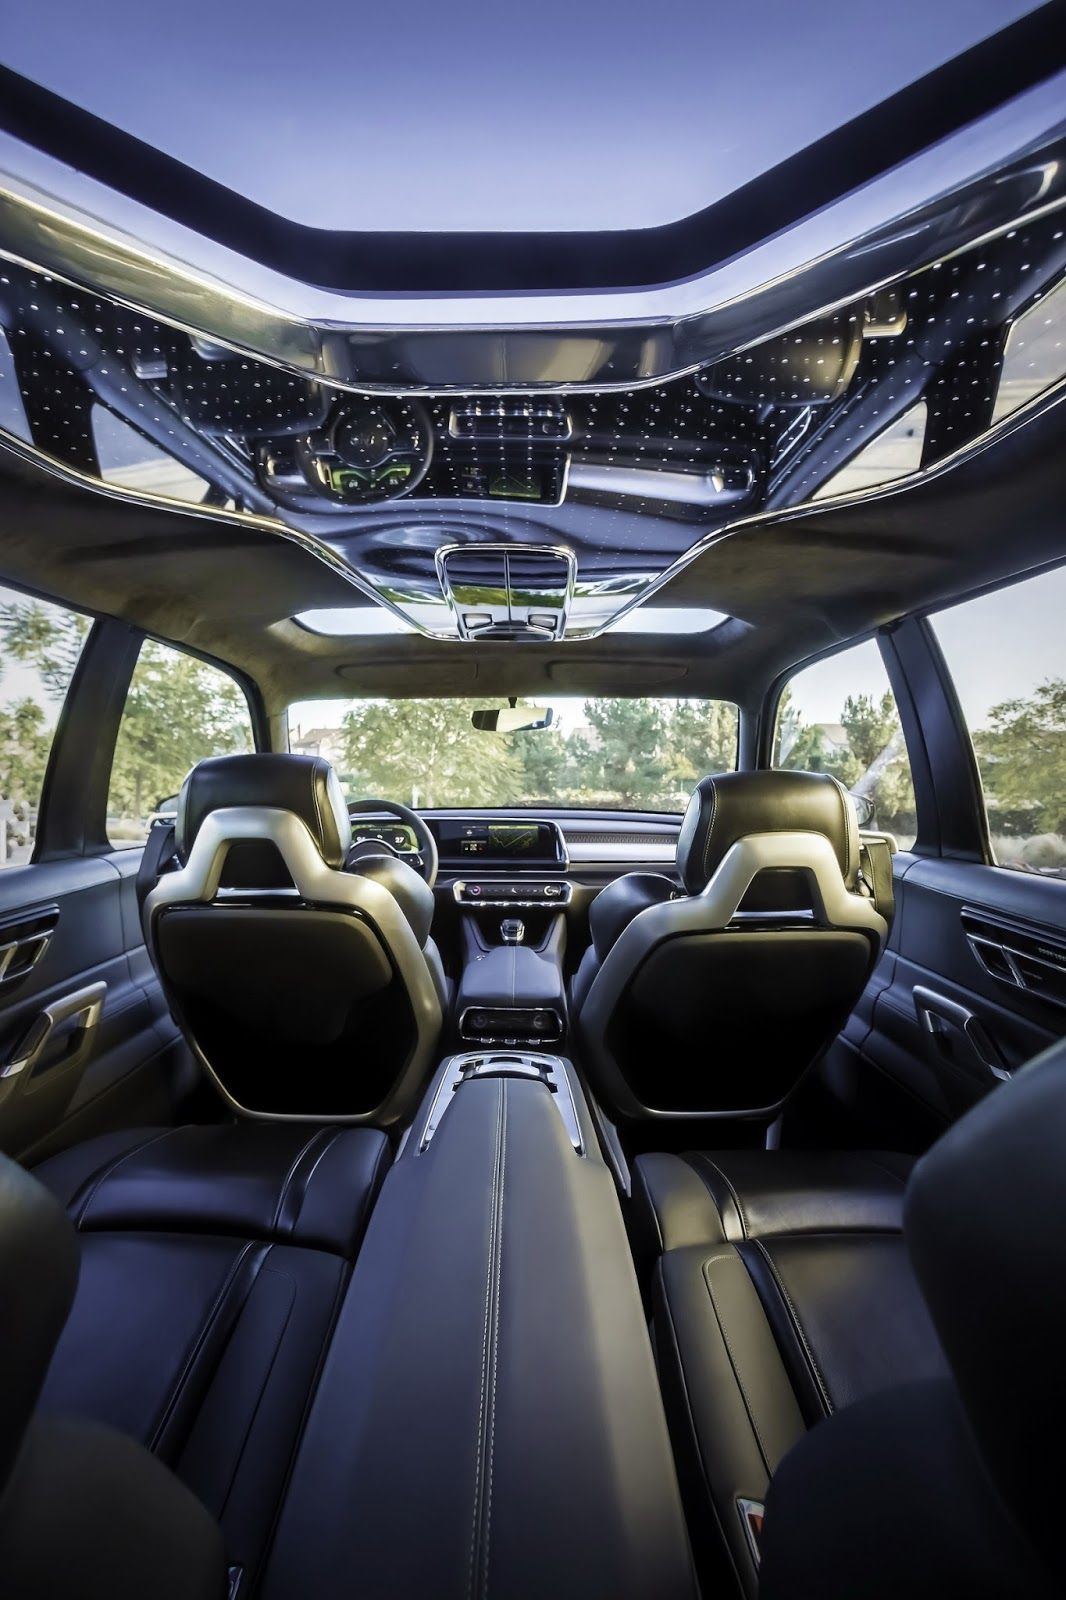 Kia Telluride Full Size Suv Concept Reportedly Heading To Production Carscoops In 2020 Luxury Car Interior Kia Telluride